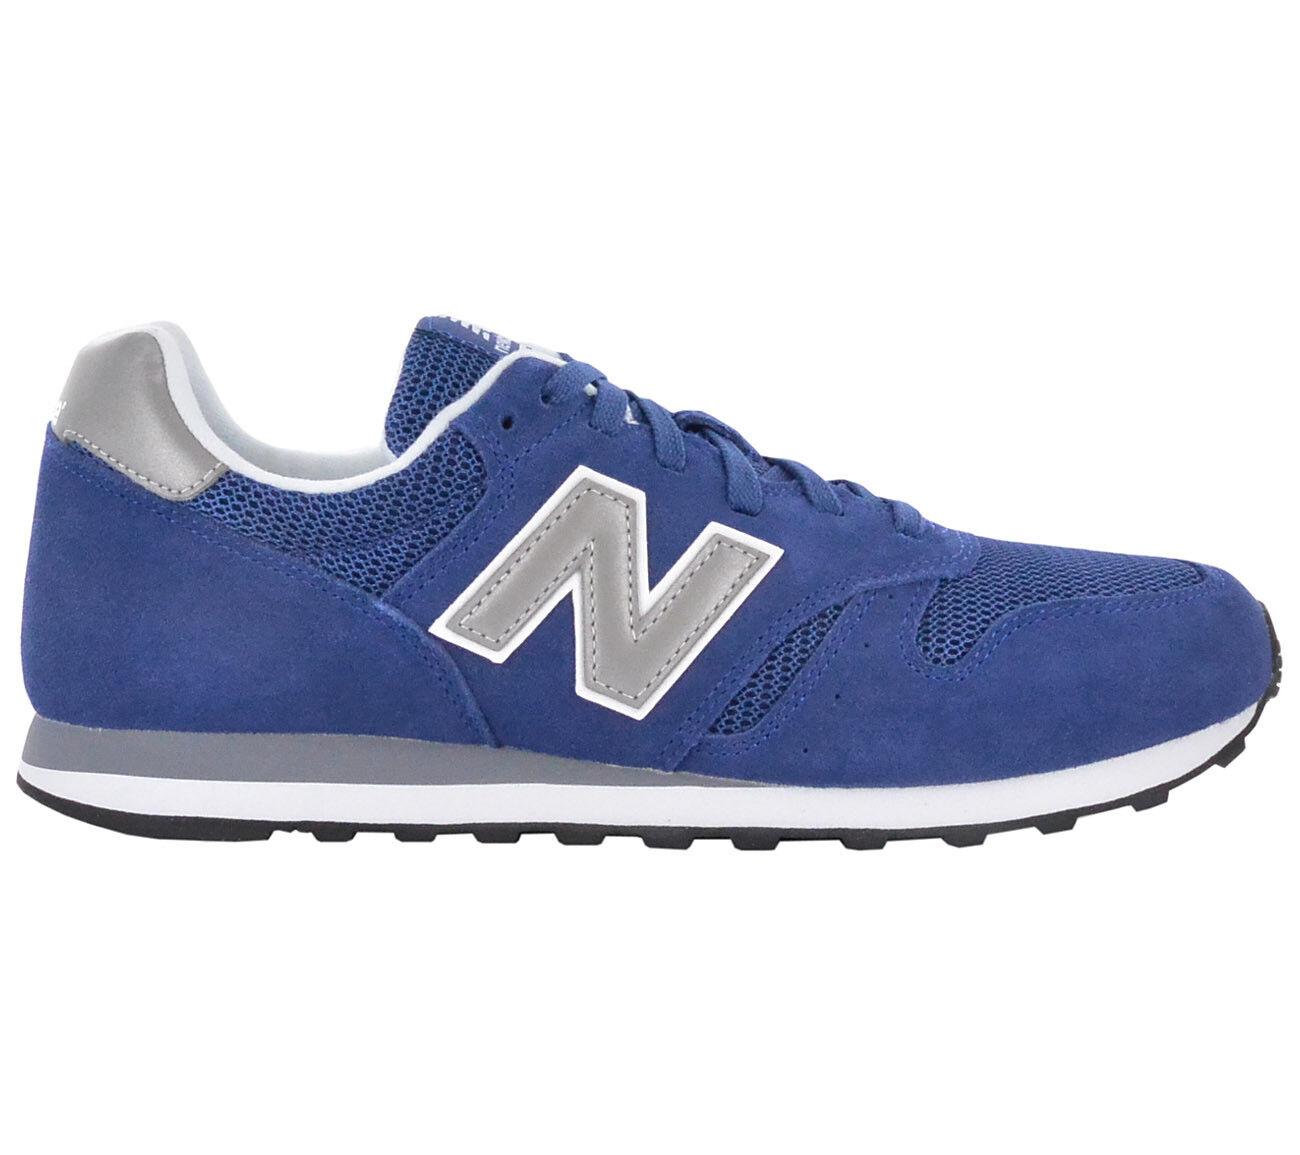 New Balance Classics Herren Turnschuhe 373 Blau Schuhe Turnschuh Turnschuh Turnschuh Freizeit ML373Blau    |  | Ermäßigung  7364f3